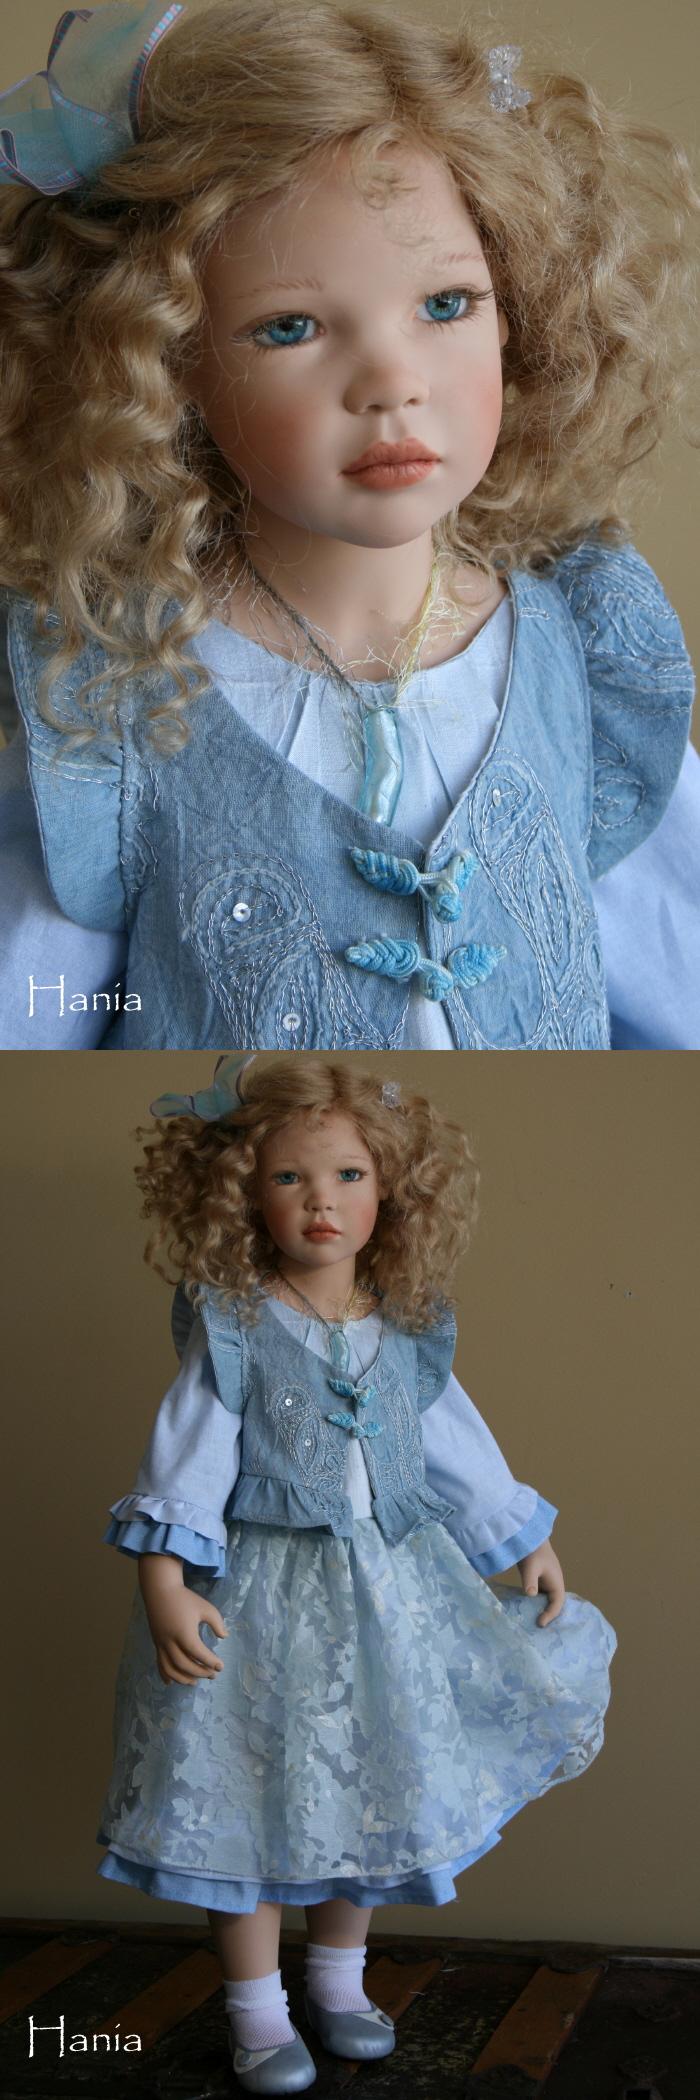 "Zawieruszynski - ""Hania"" - 2009  29 inches tall Vinyl Doll"